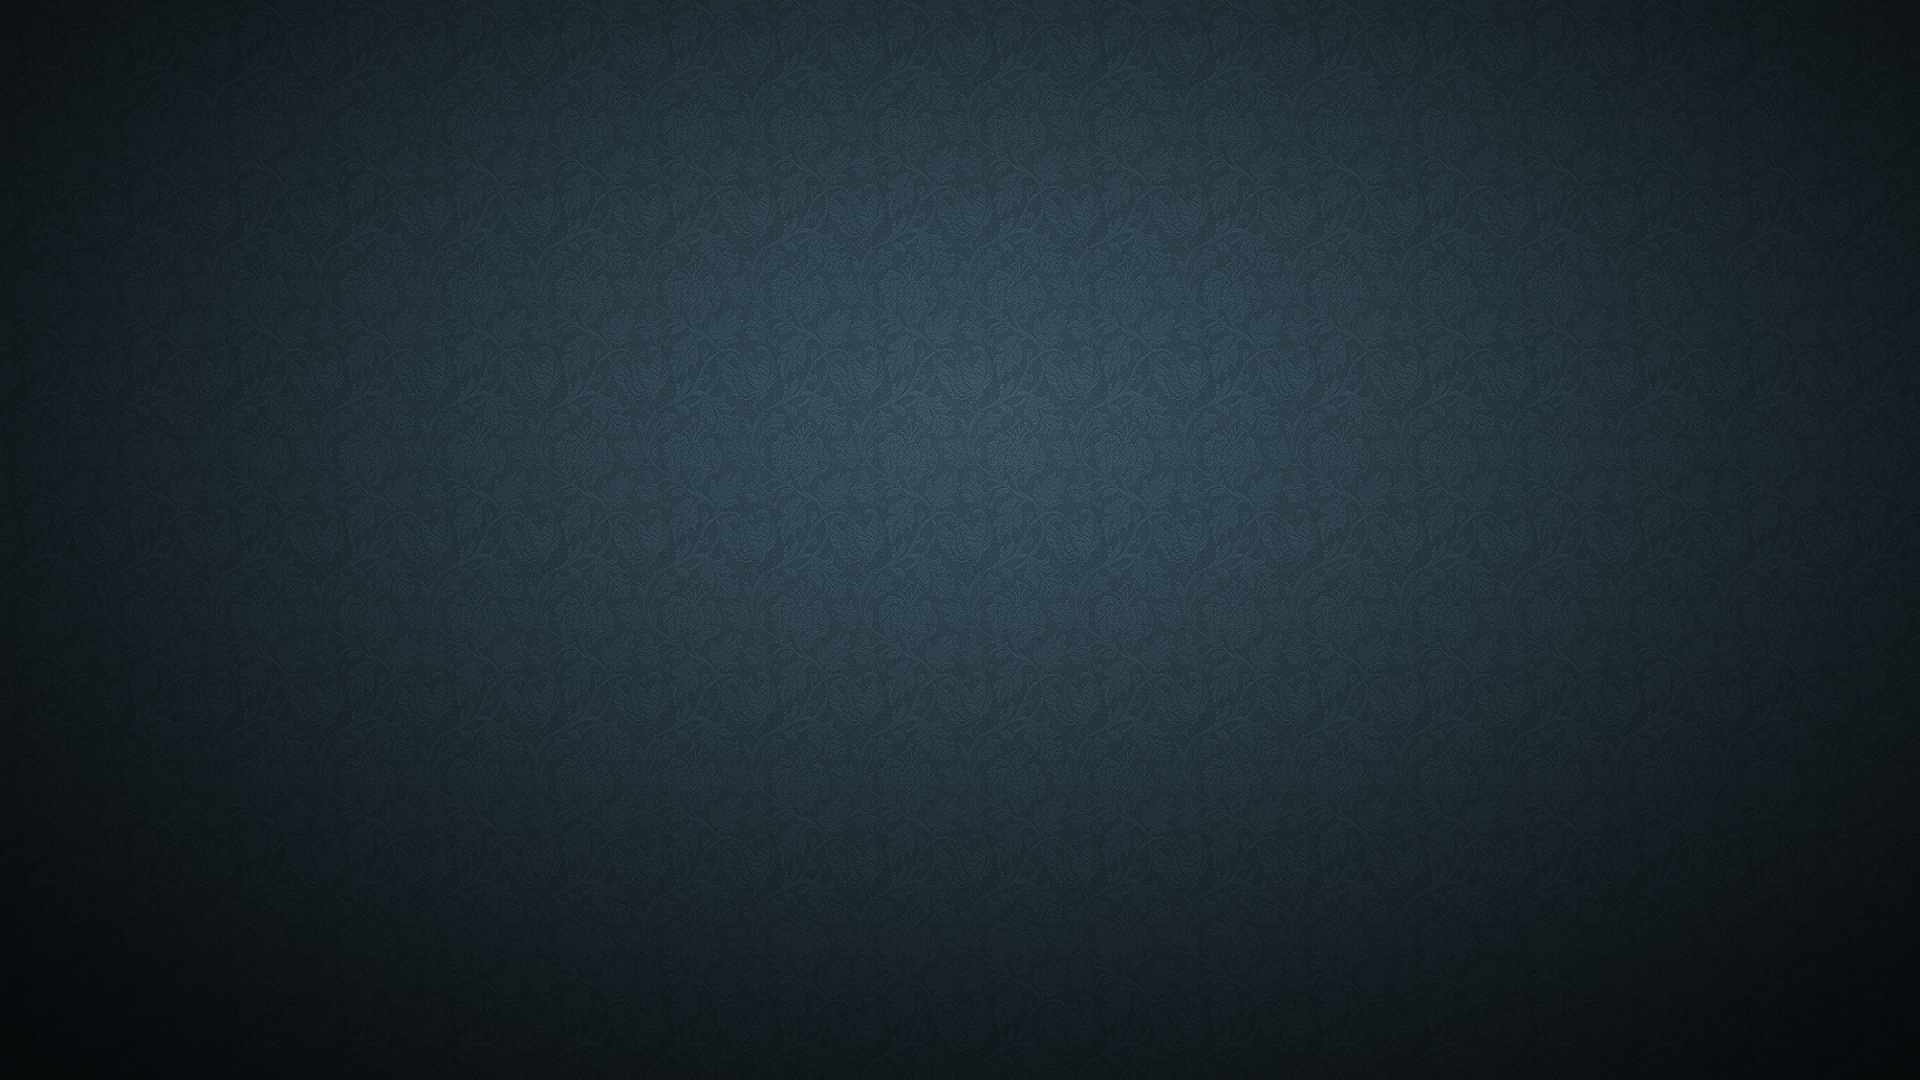 Download 8000+ Wallpaper Abyss Minimalist  Gratis